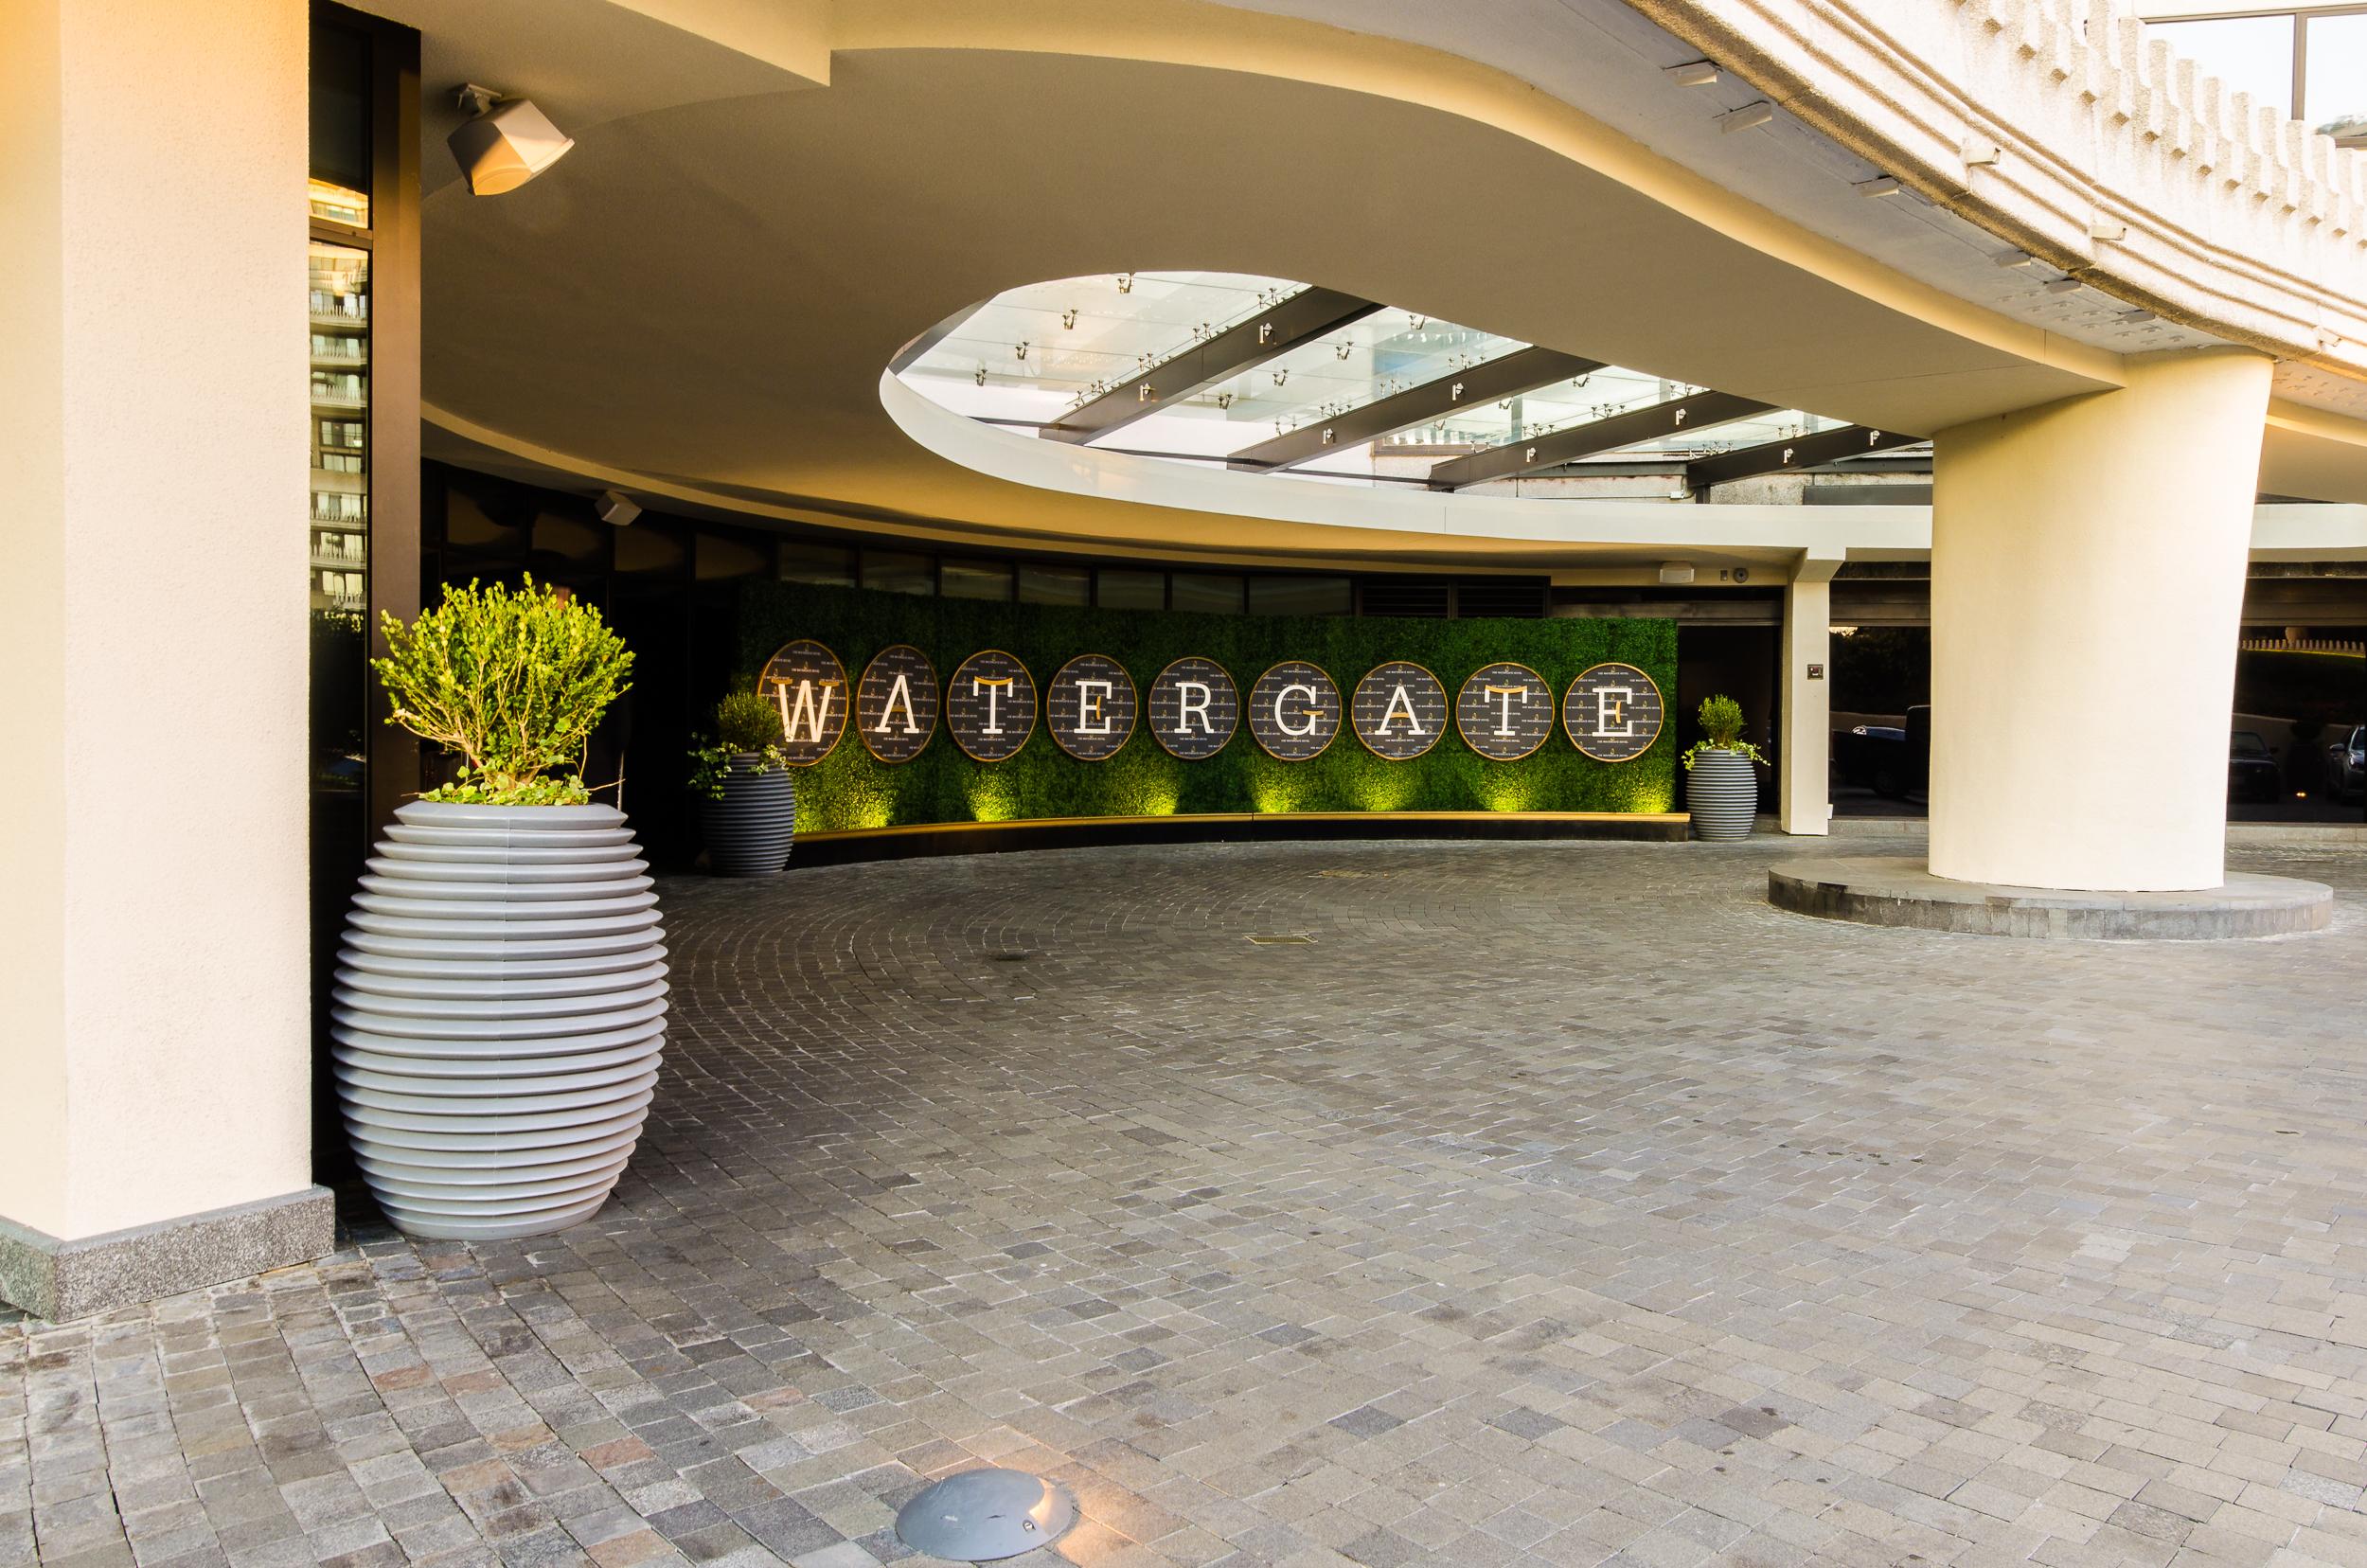 29_Watergate Hotel 01.jpg